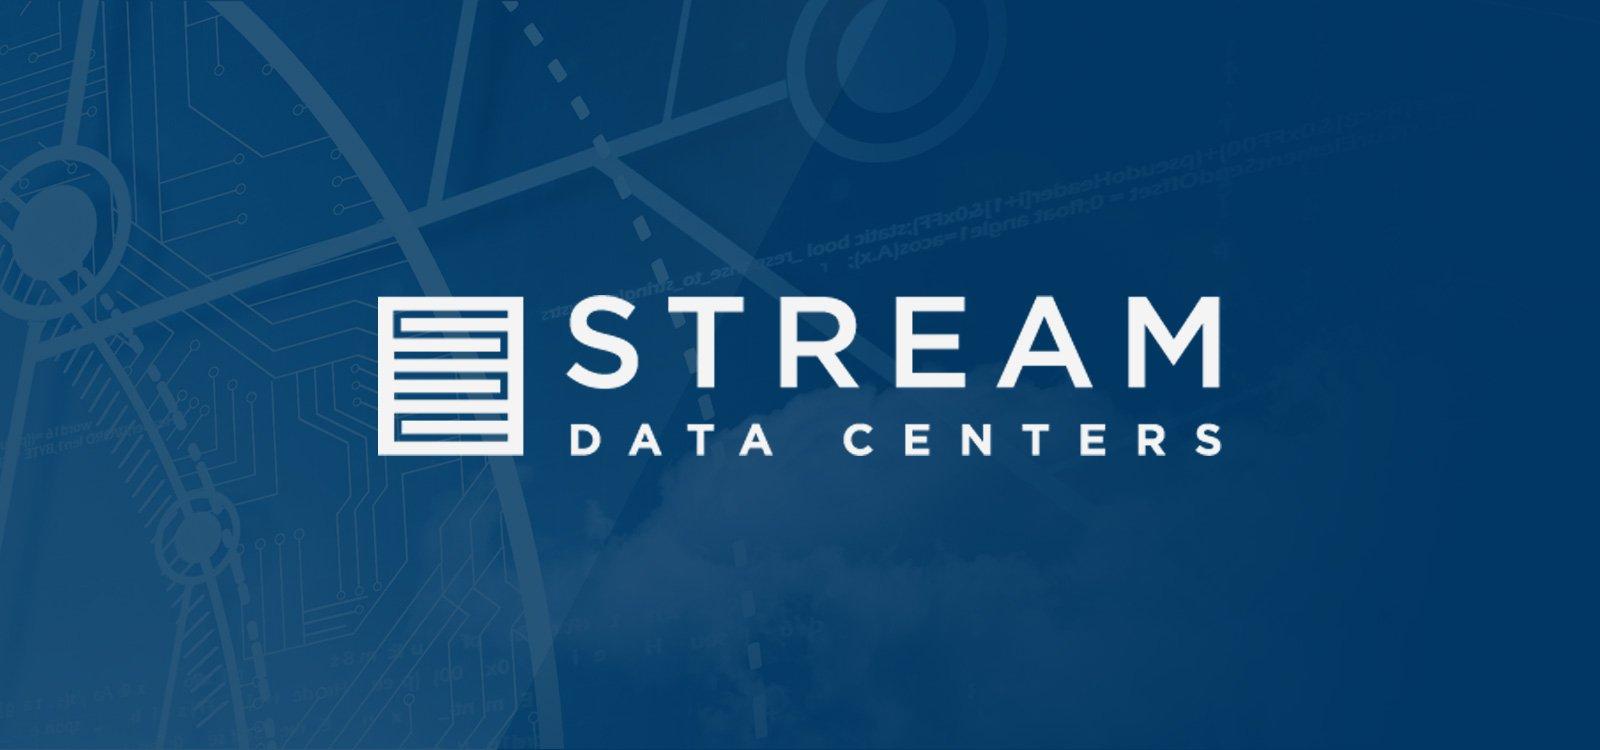 Stream Data Centers Expands Leadership Team